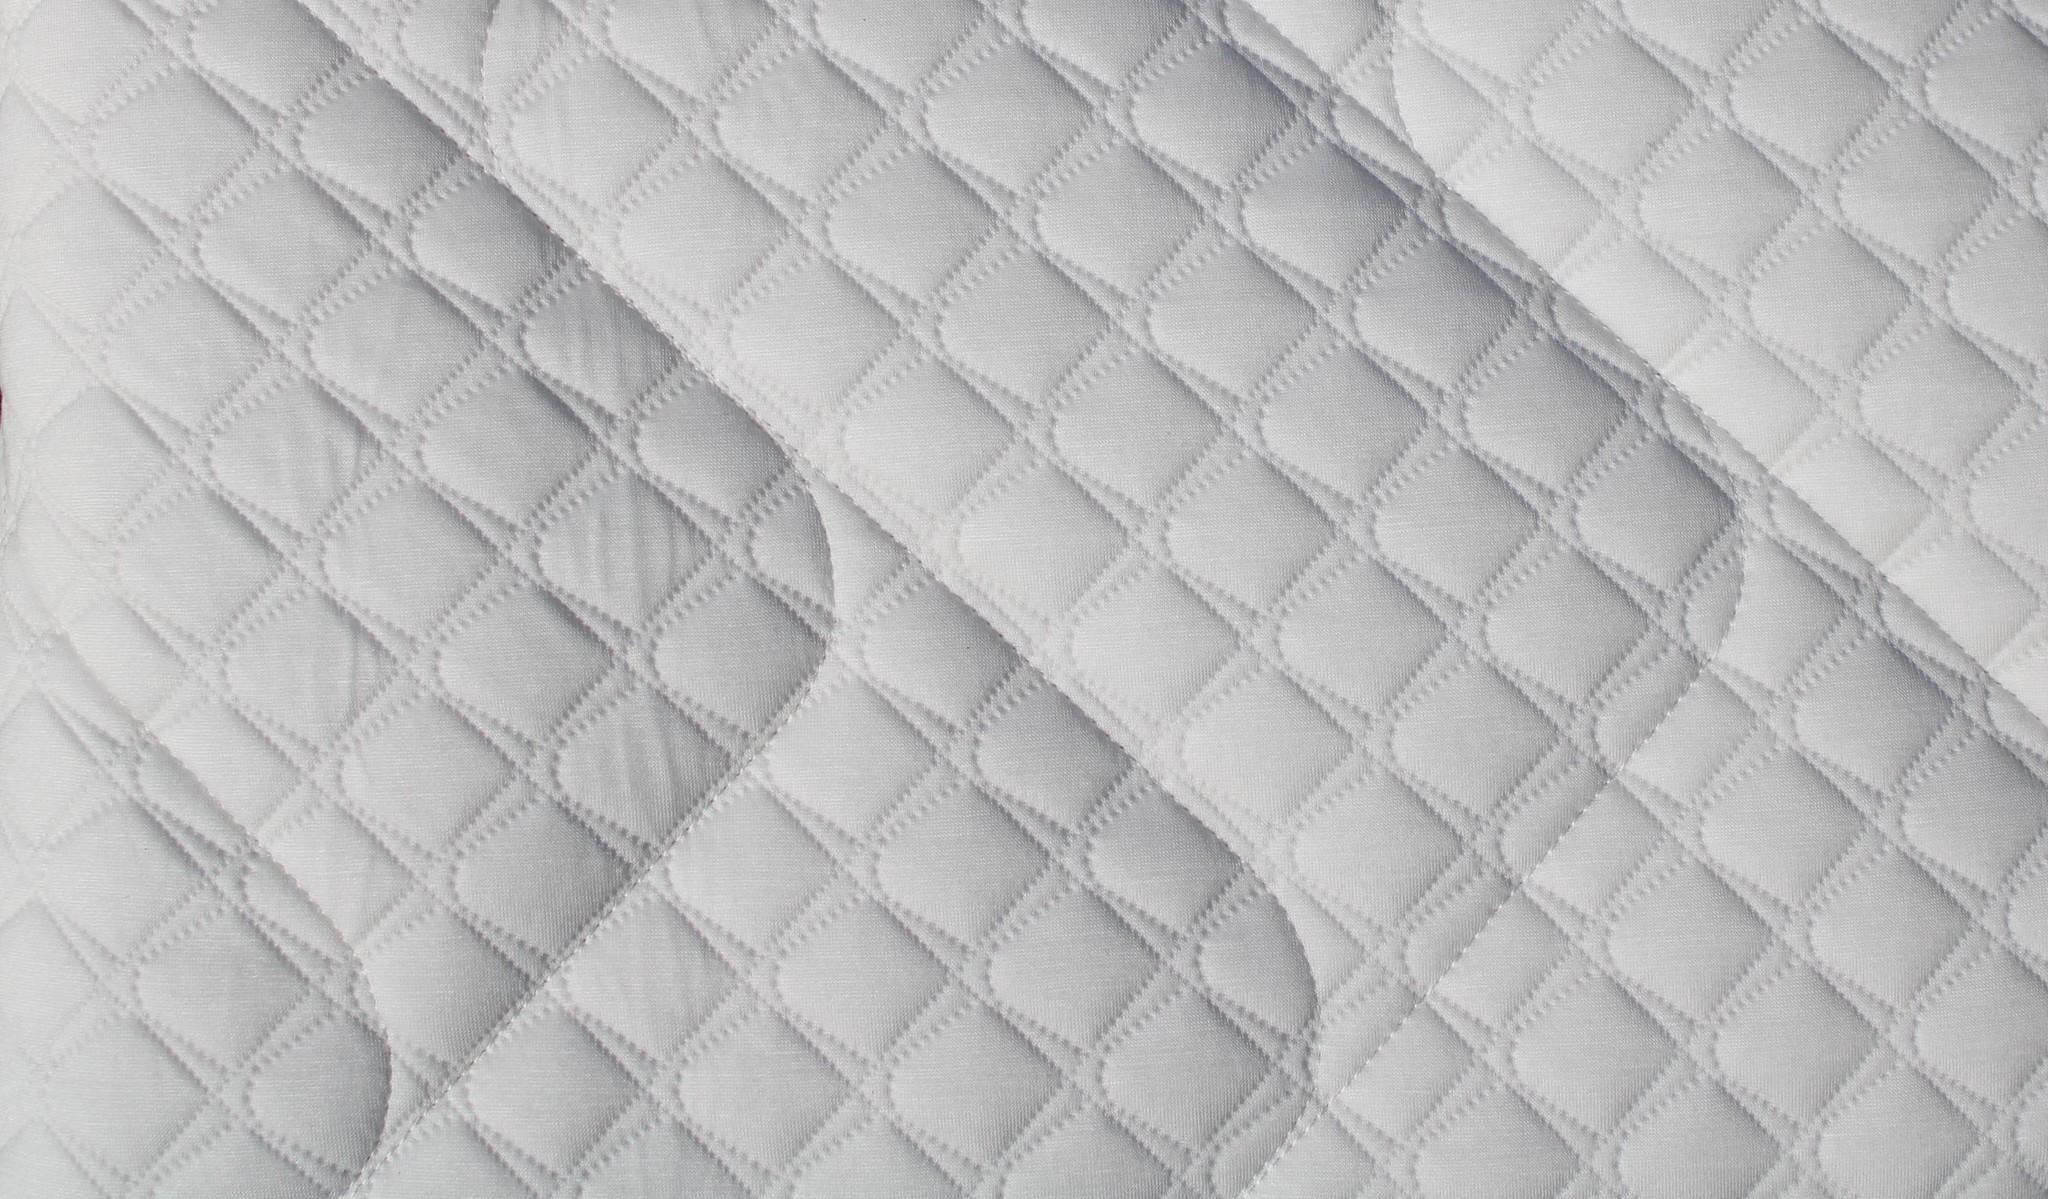 Sarpy Kindermatras 80x180 Sertel Tailor Made Mattress